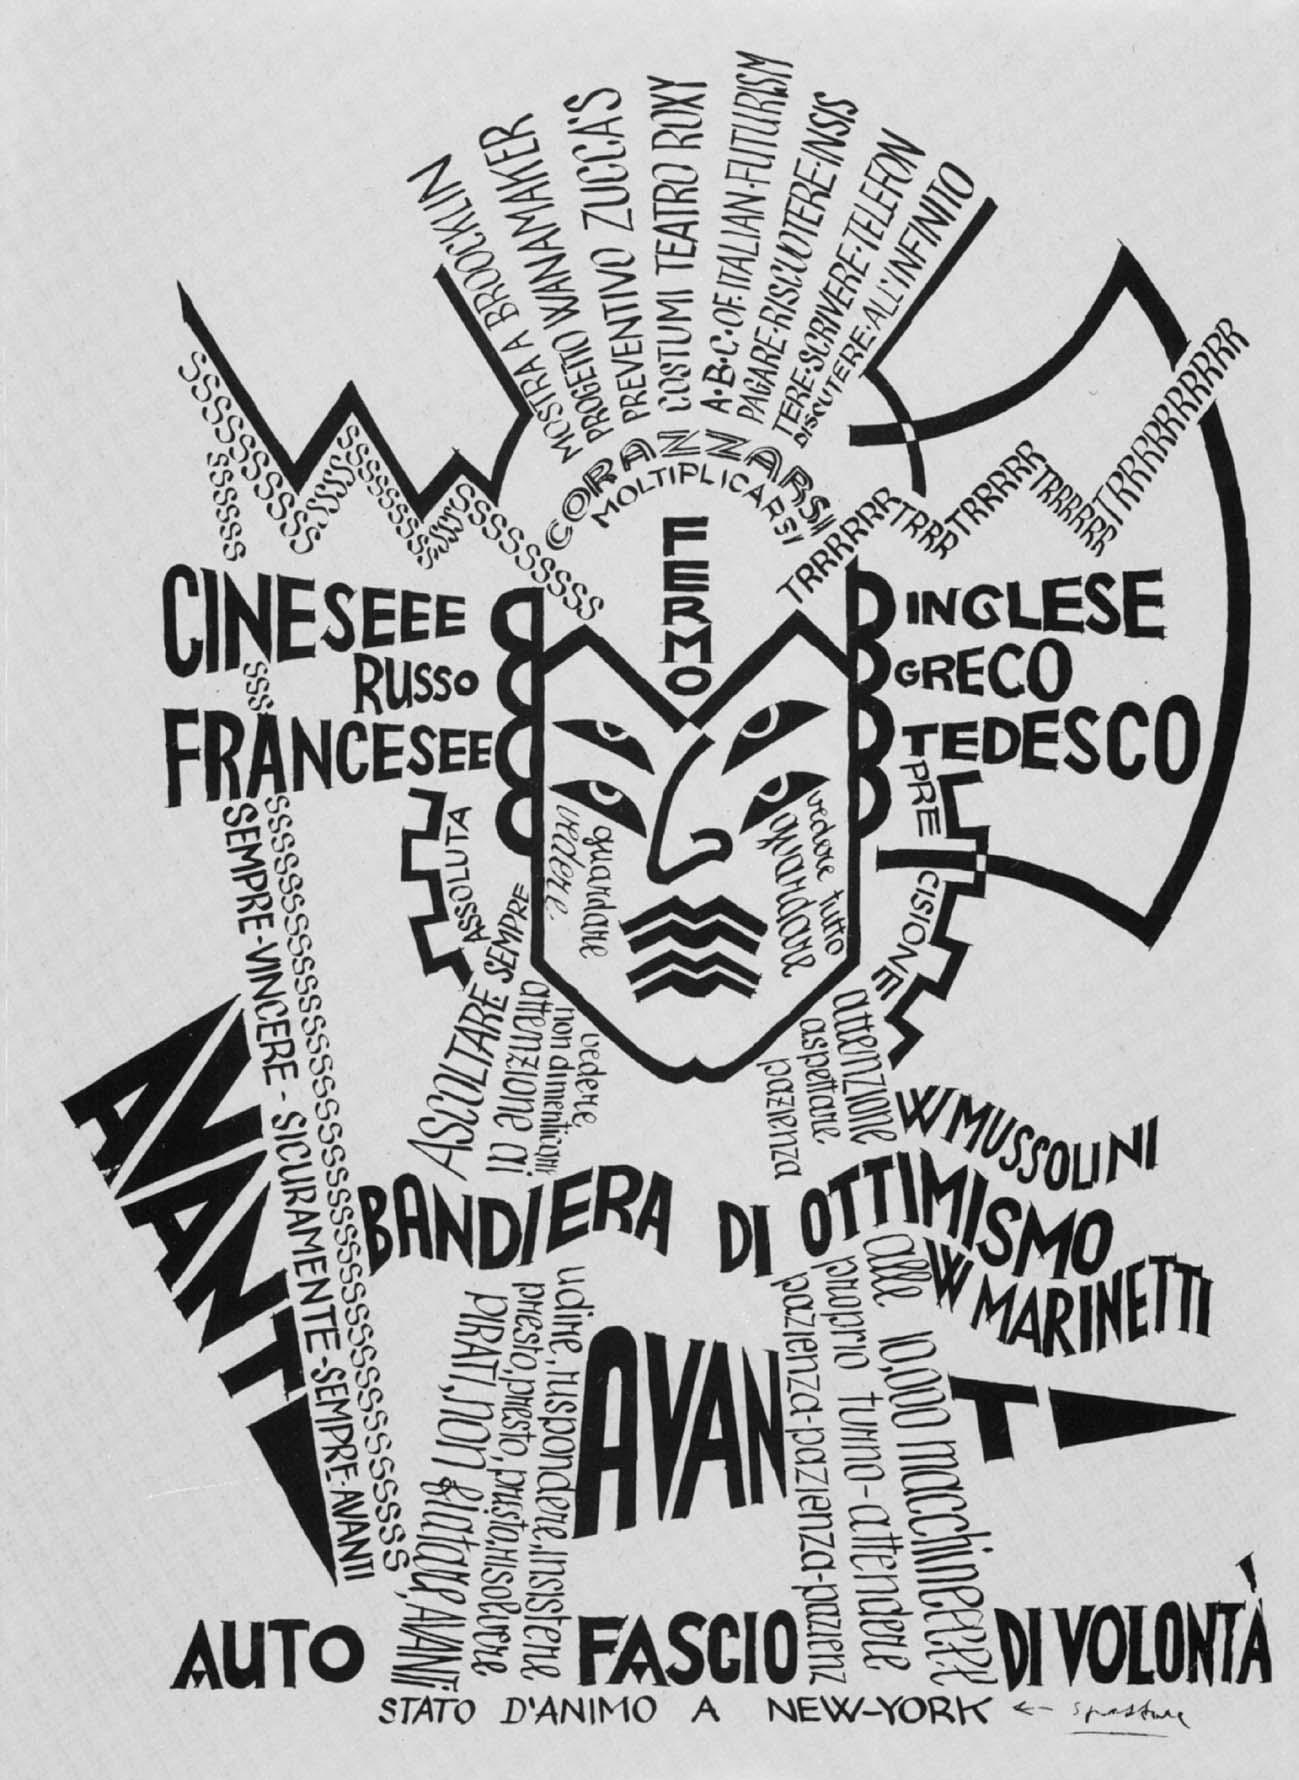 Fortunato_Depero_States_of_Mind_in_New_York_1930_.jpg